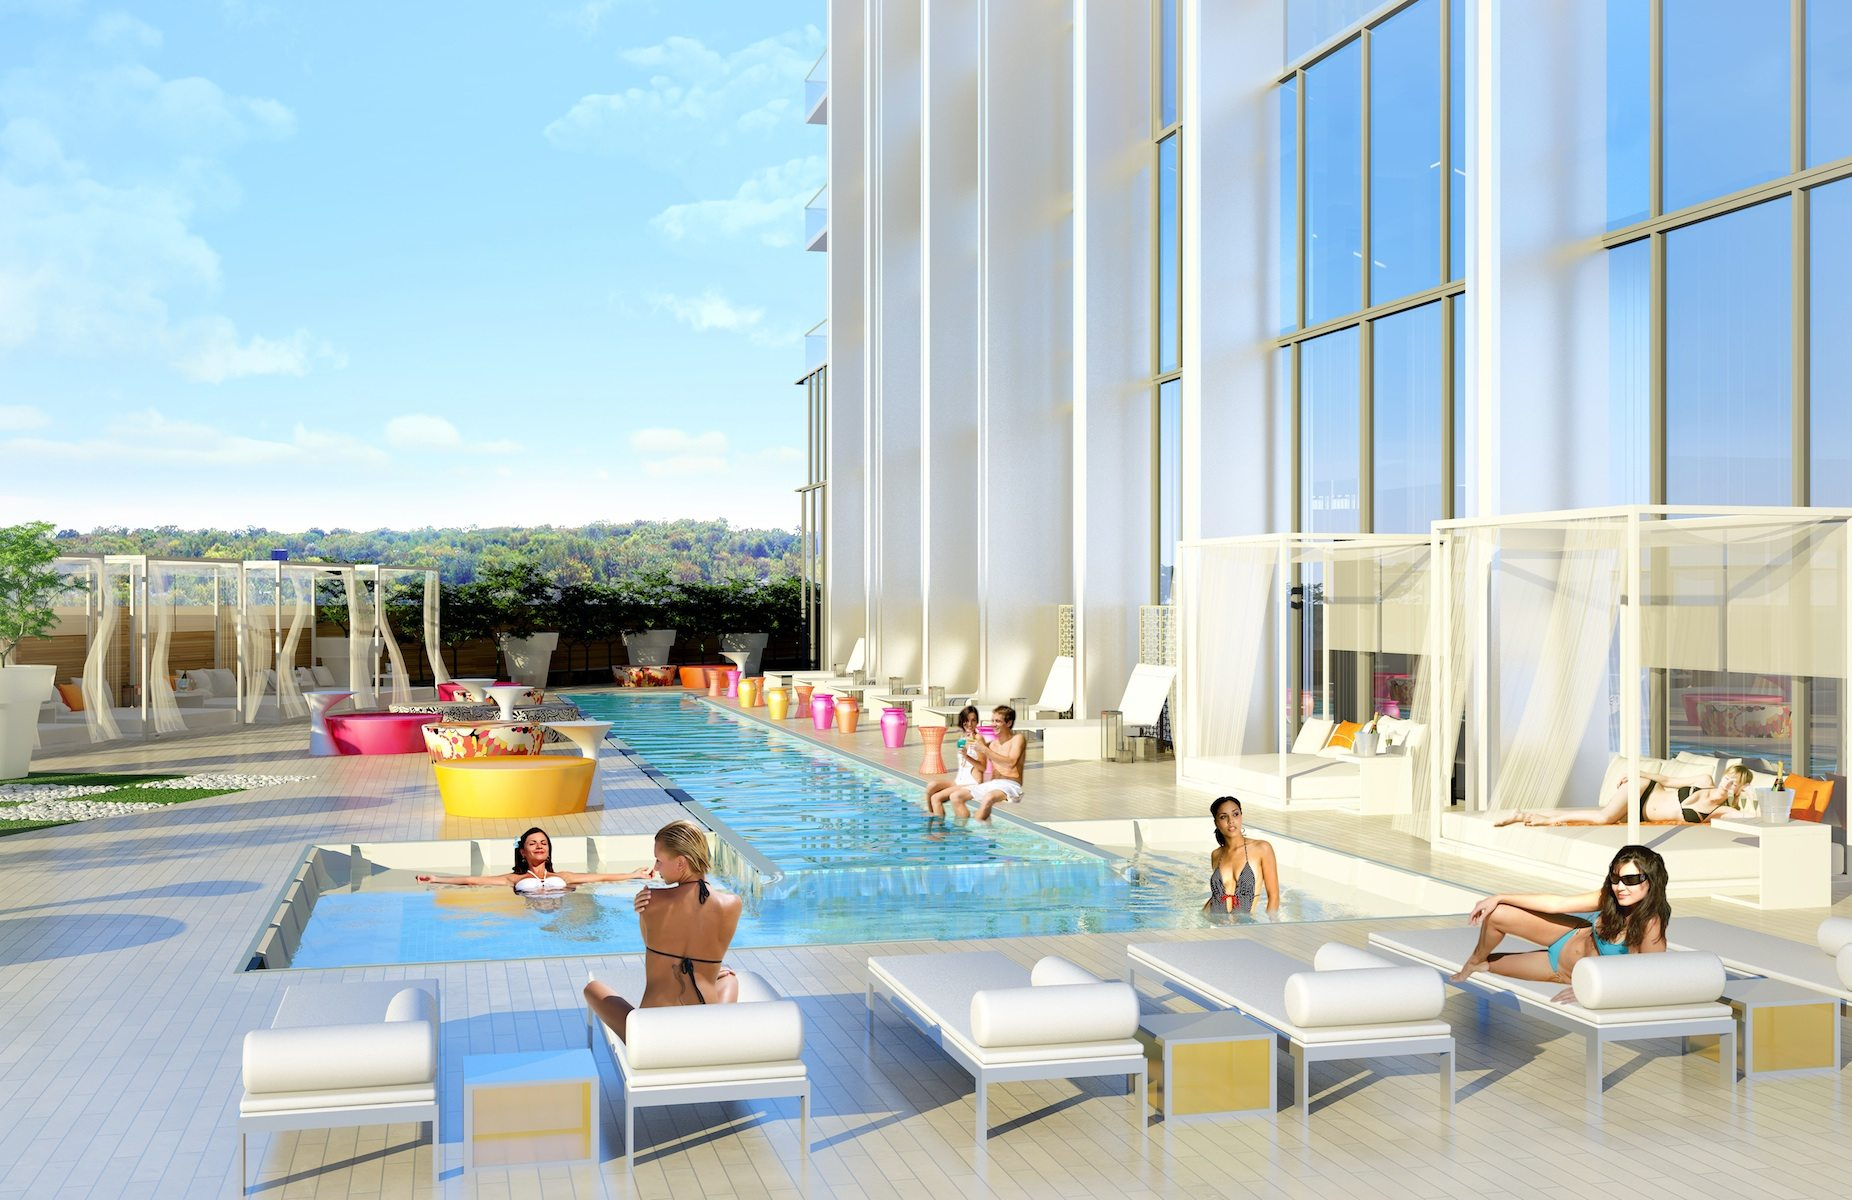 South Beach Condos & Lofts Swimming Pool Toronto, Canada